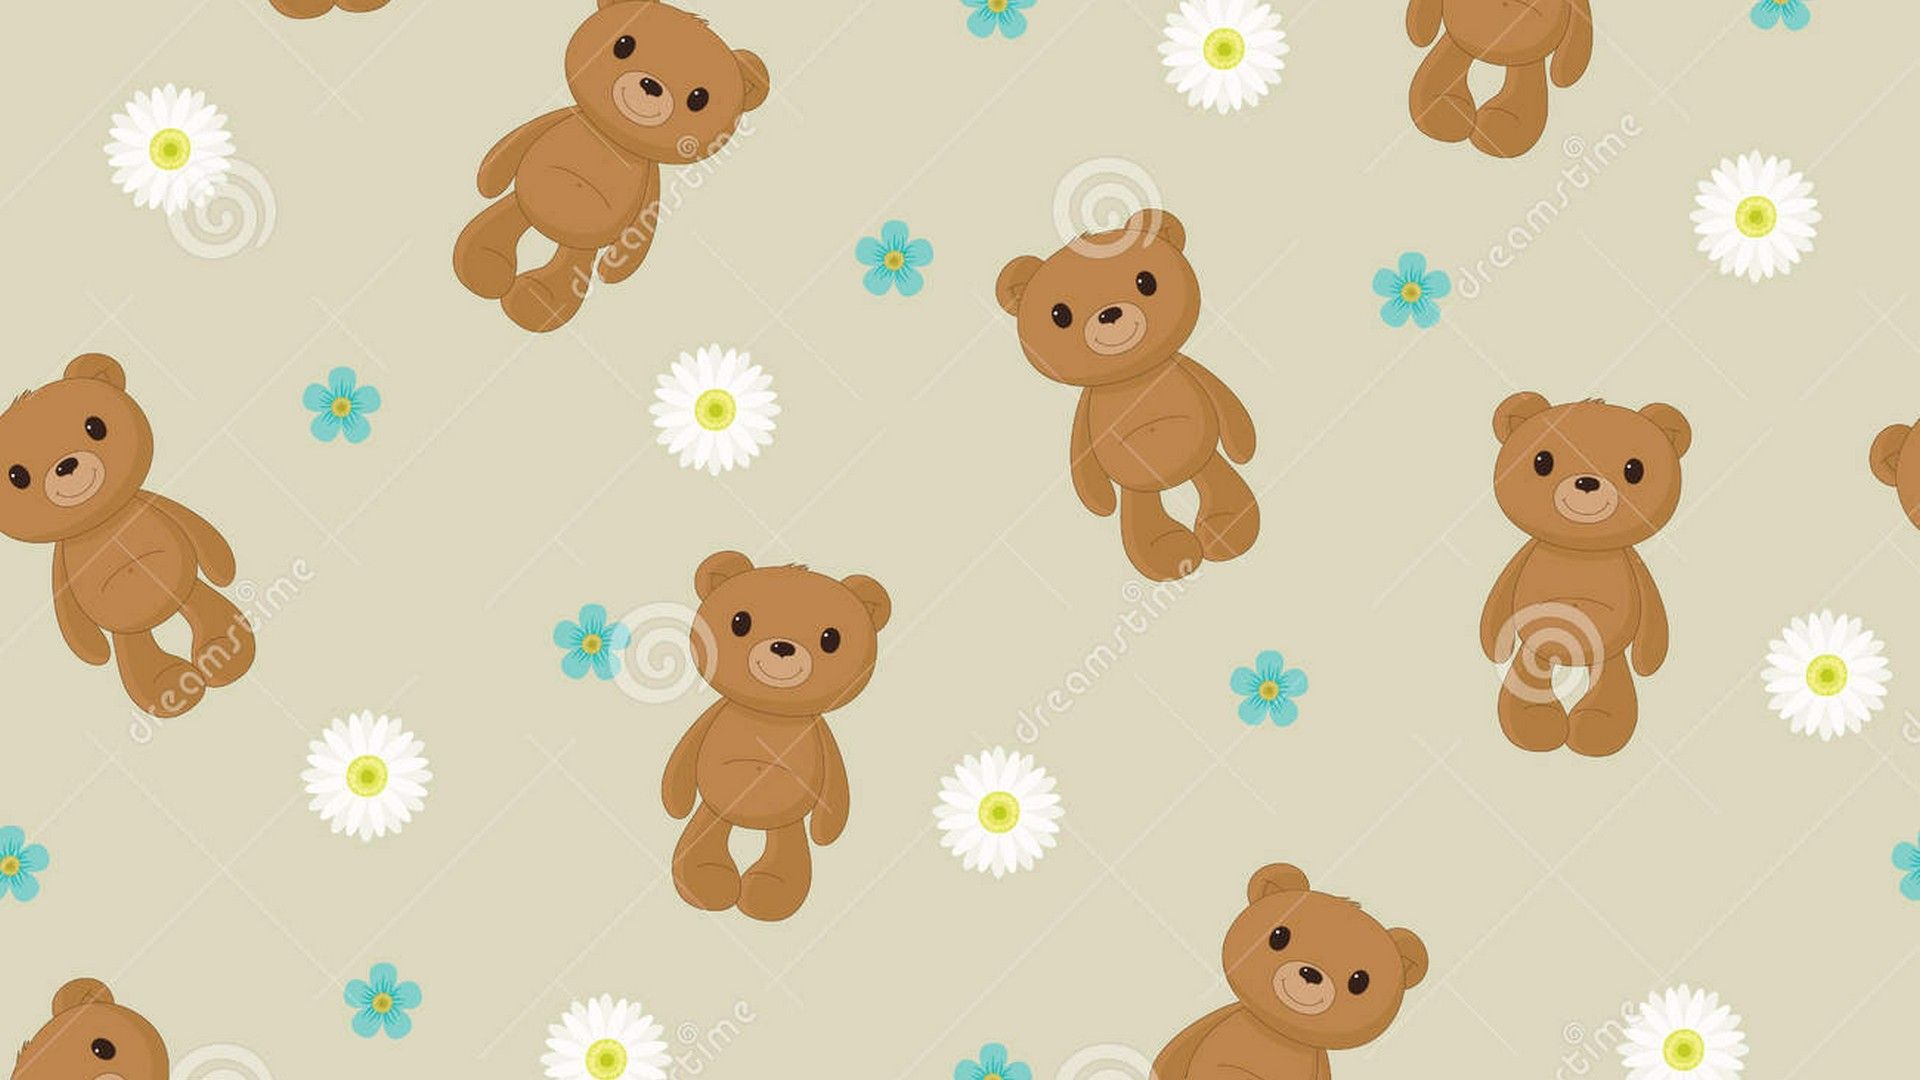 Big Teddy Bear Desktop Backgrounds 2021 Live Wallpaper Hd Big Teddy Bear Backgrounds Desktop Teddy Bear